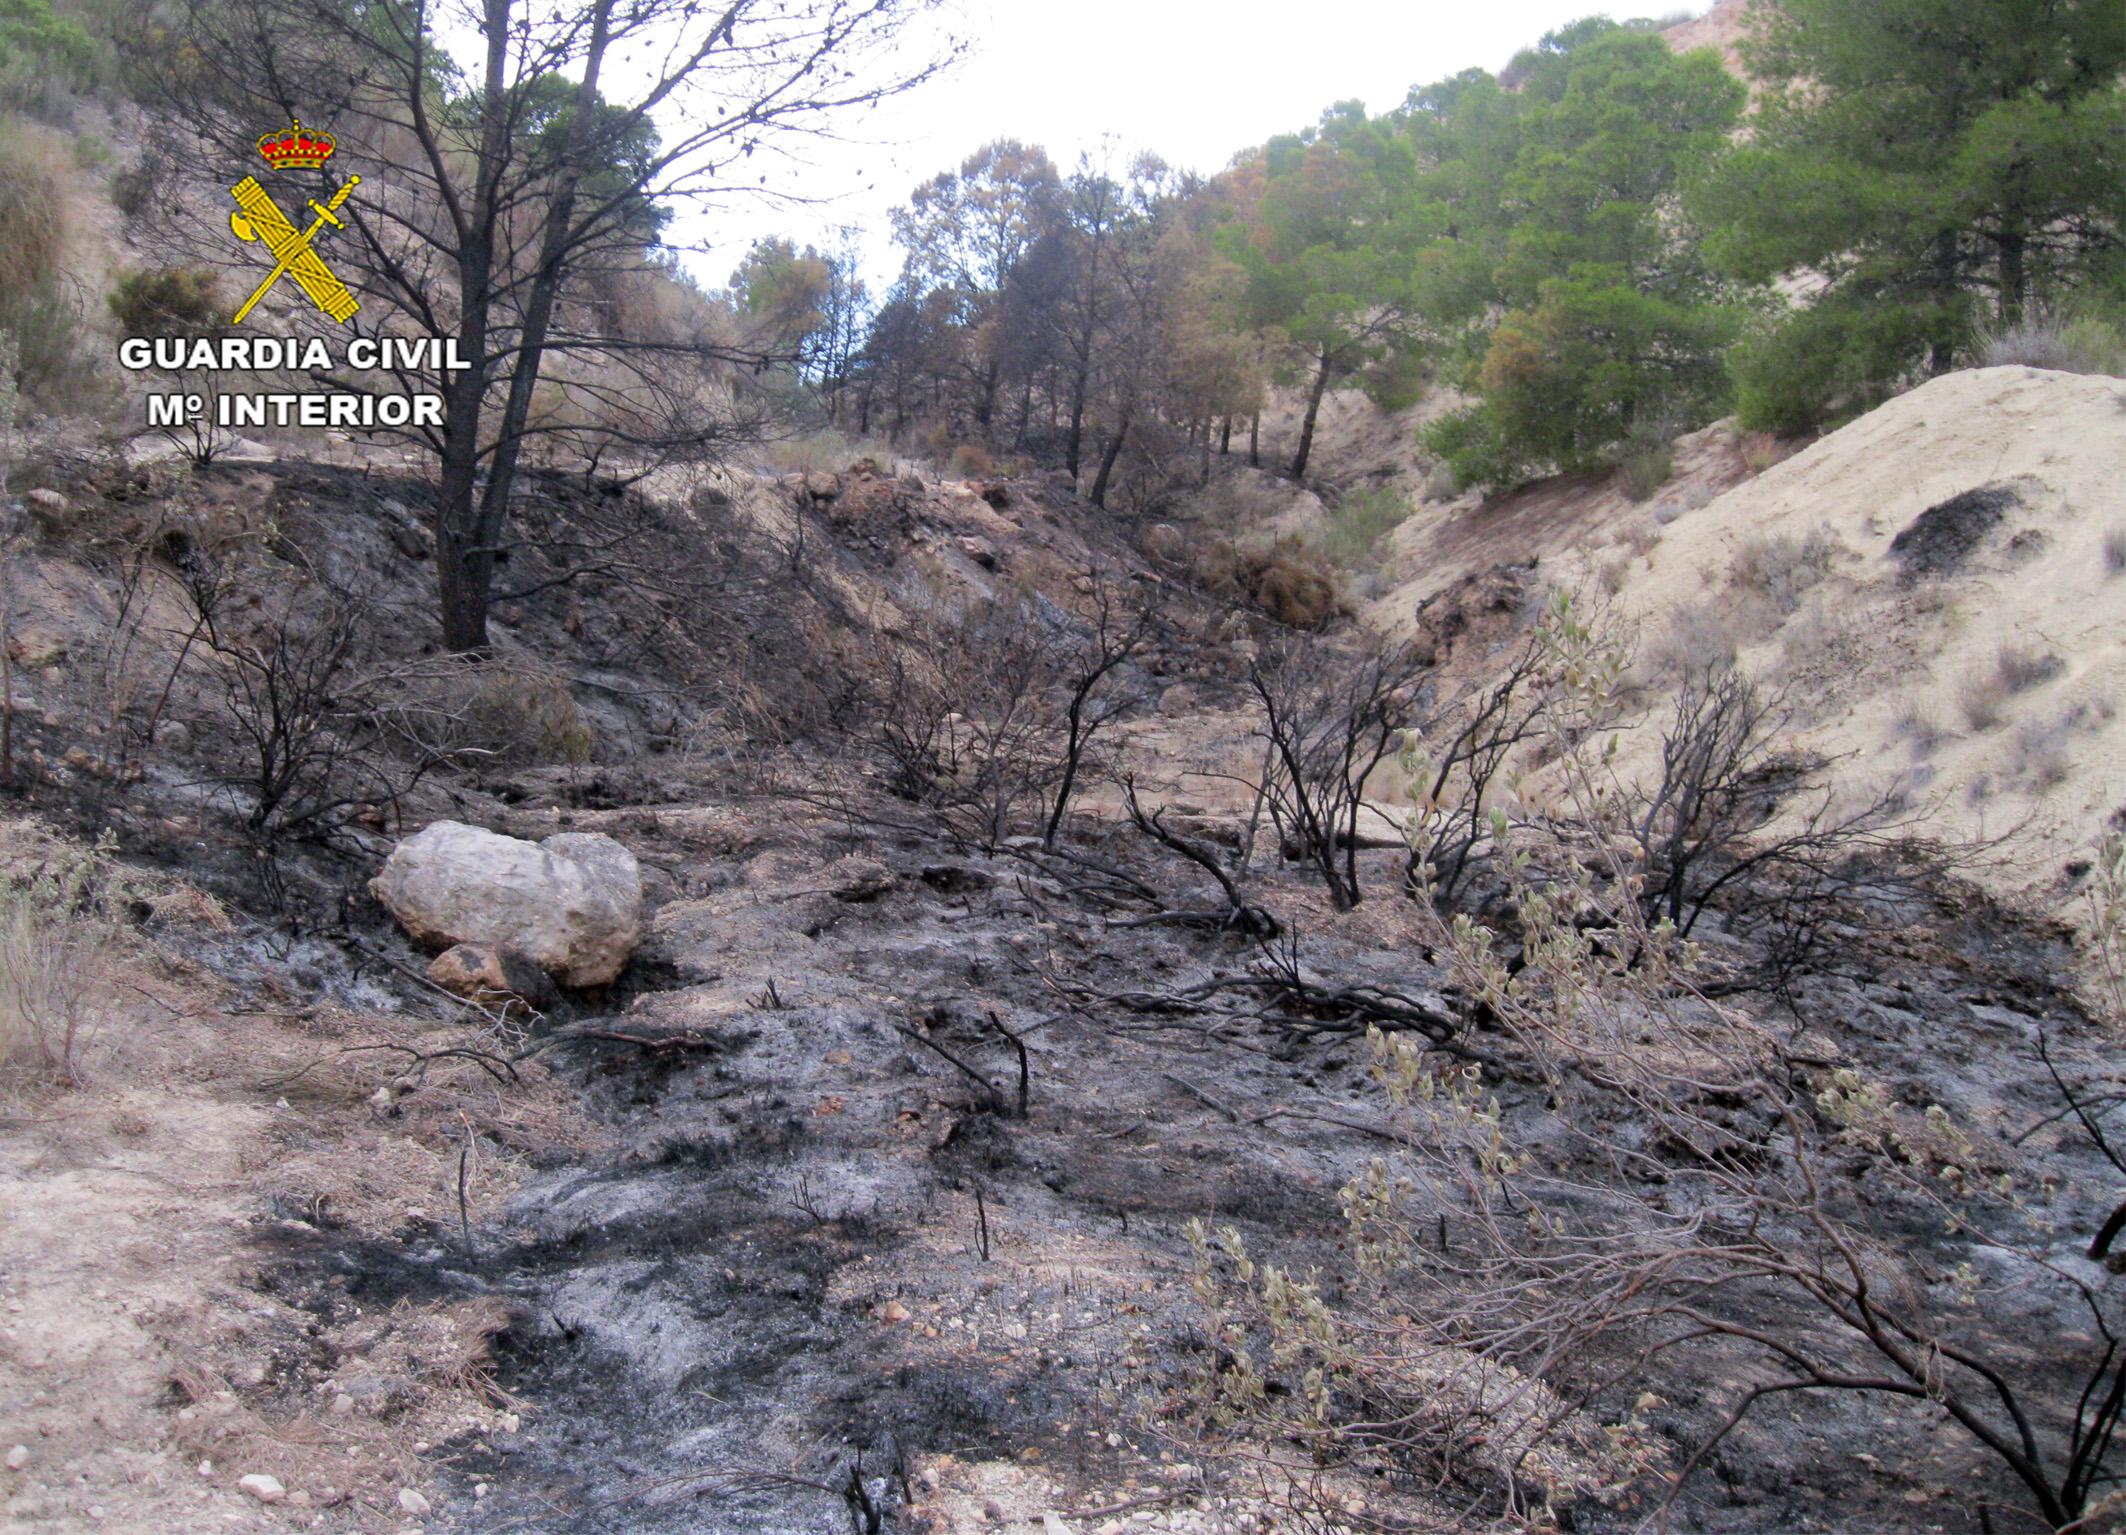 Aspecto del área afectada tras el incendio. Imagen: Guardia Civil